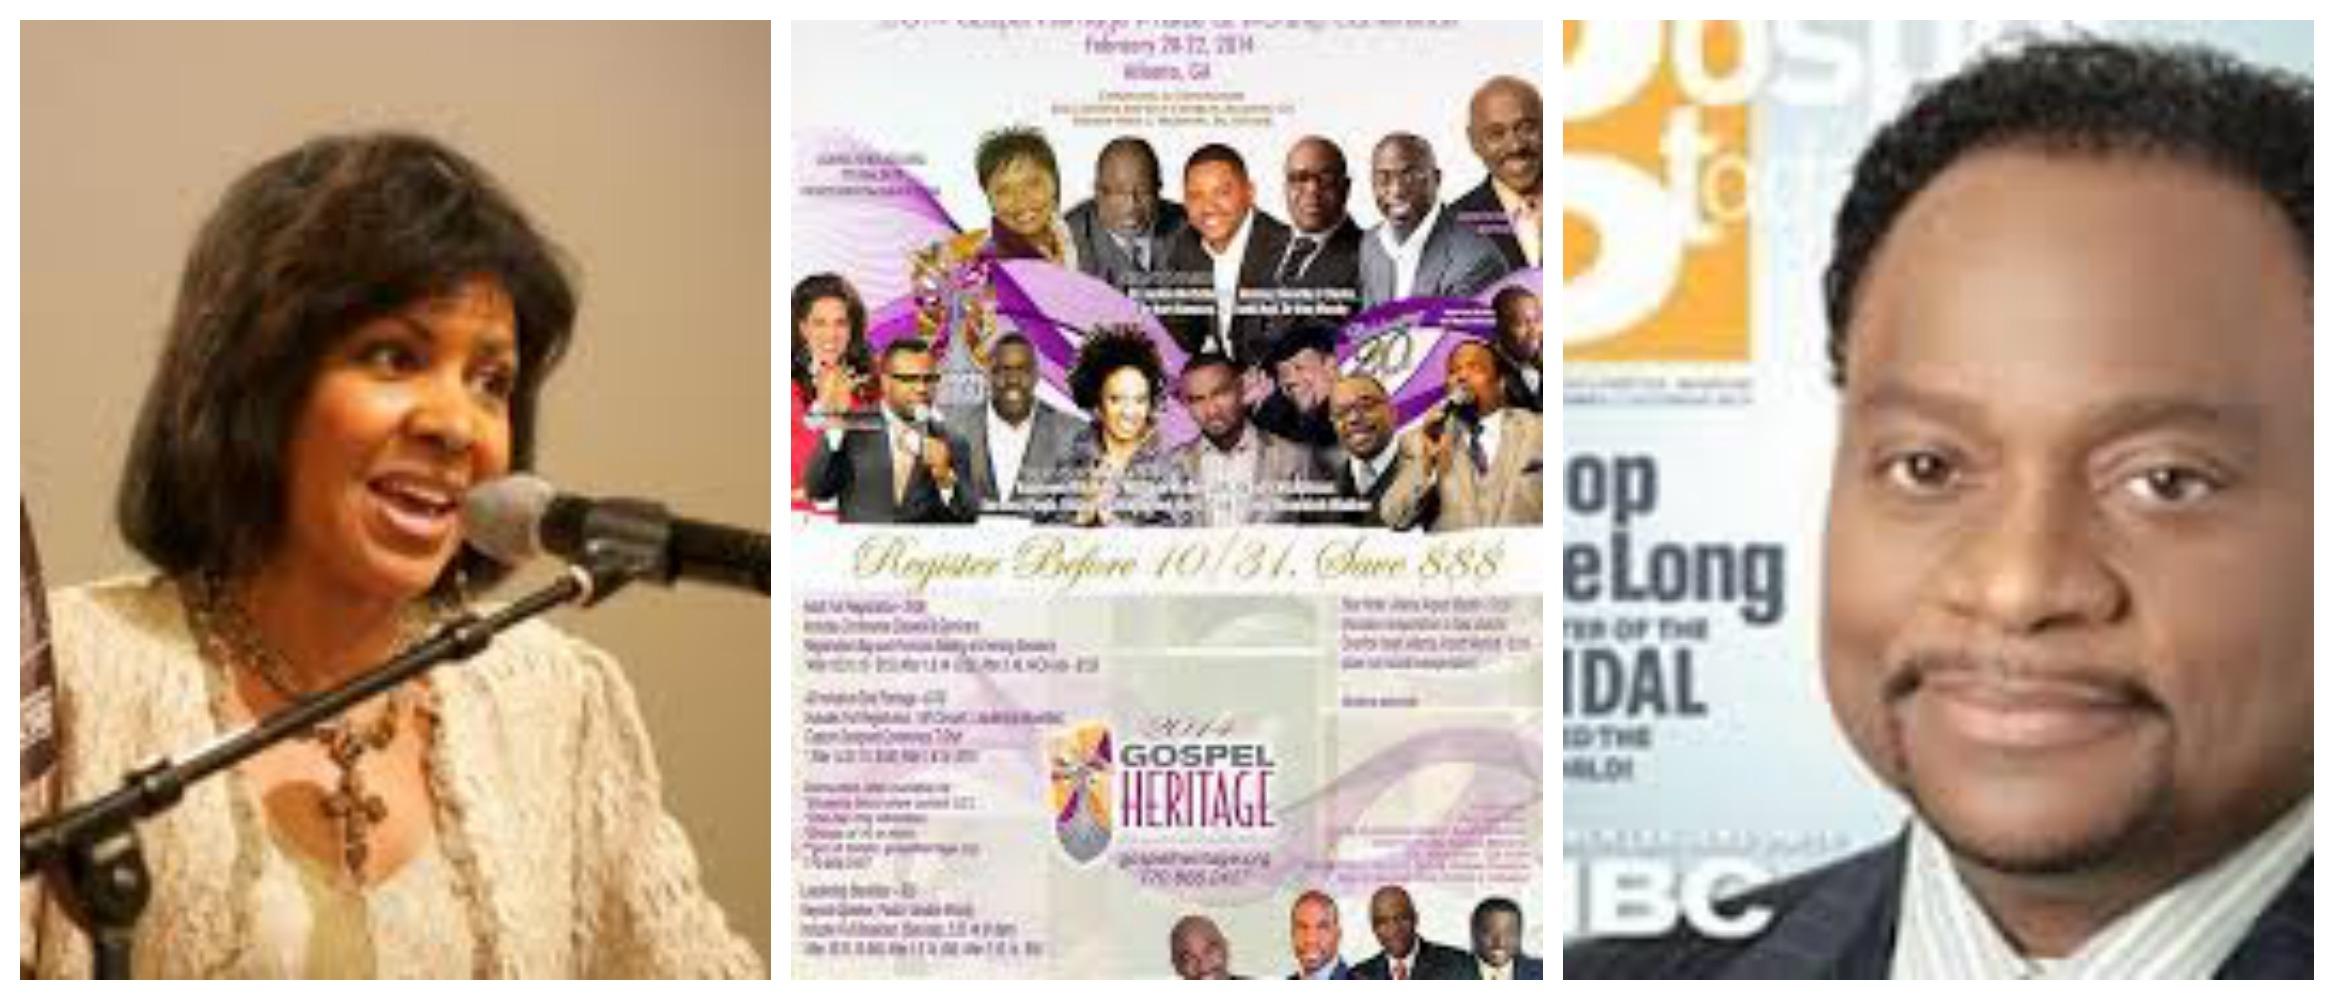 eddie-long-gospel-heritage-conference